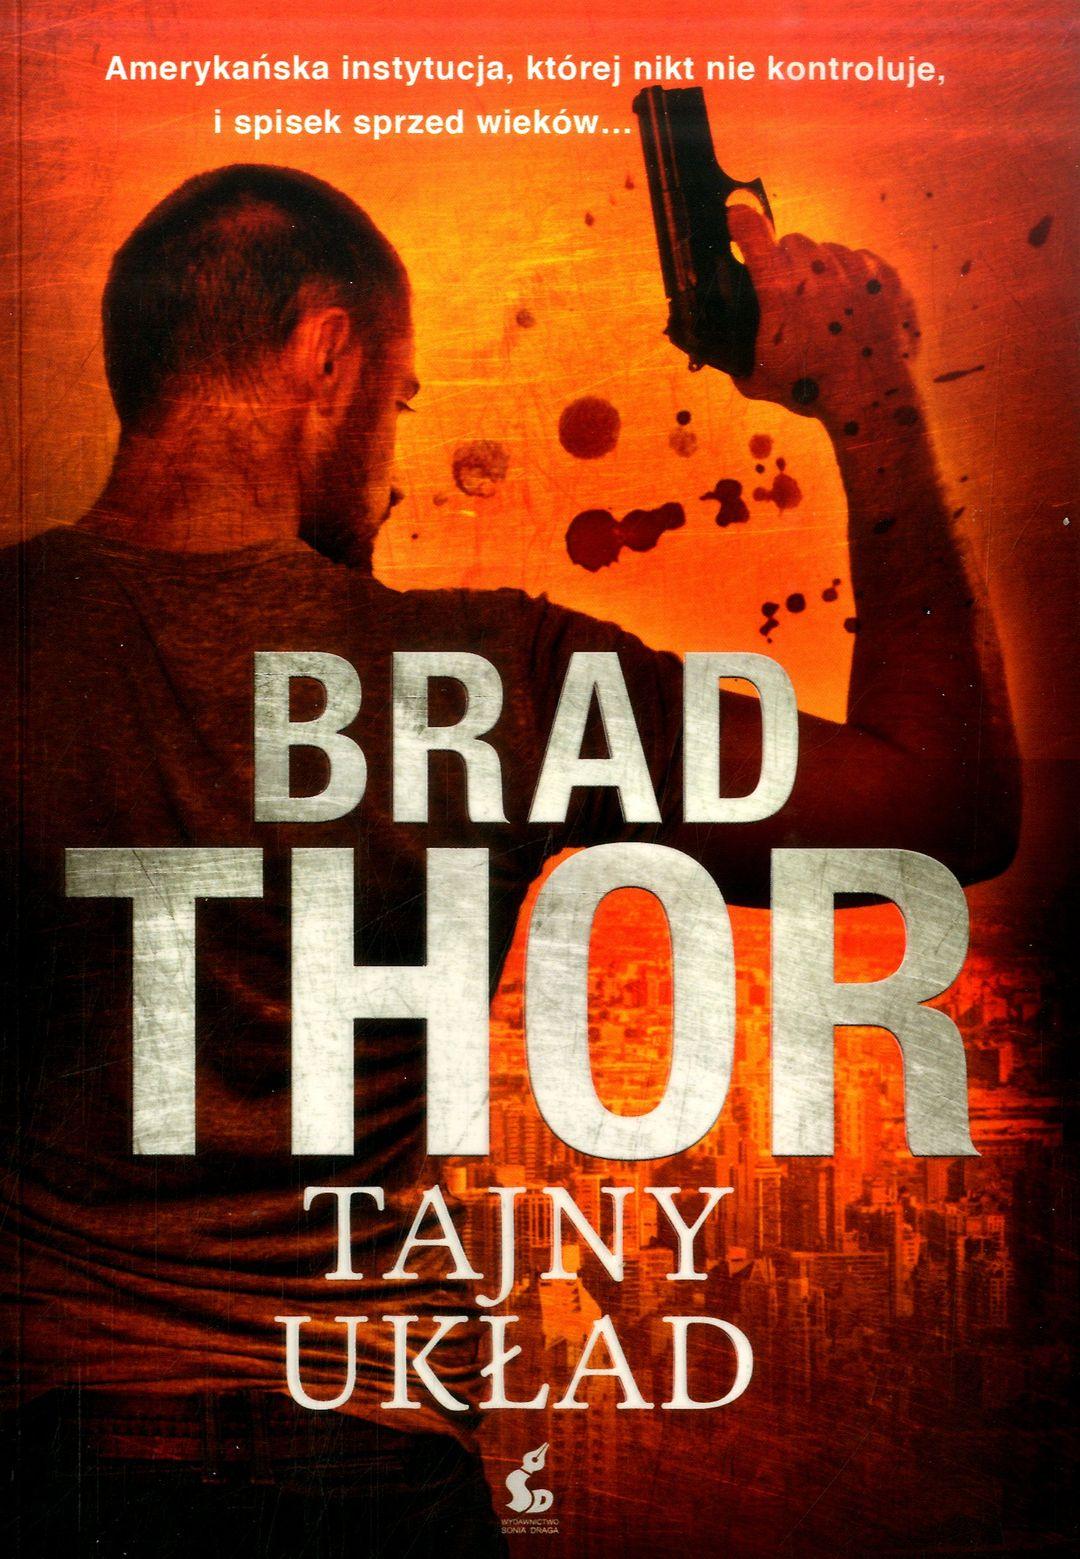 Thor Brad – Tajny Układ